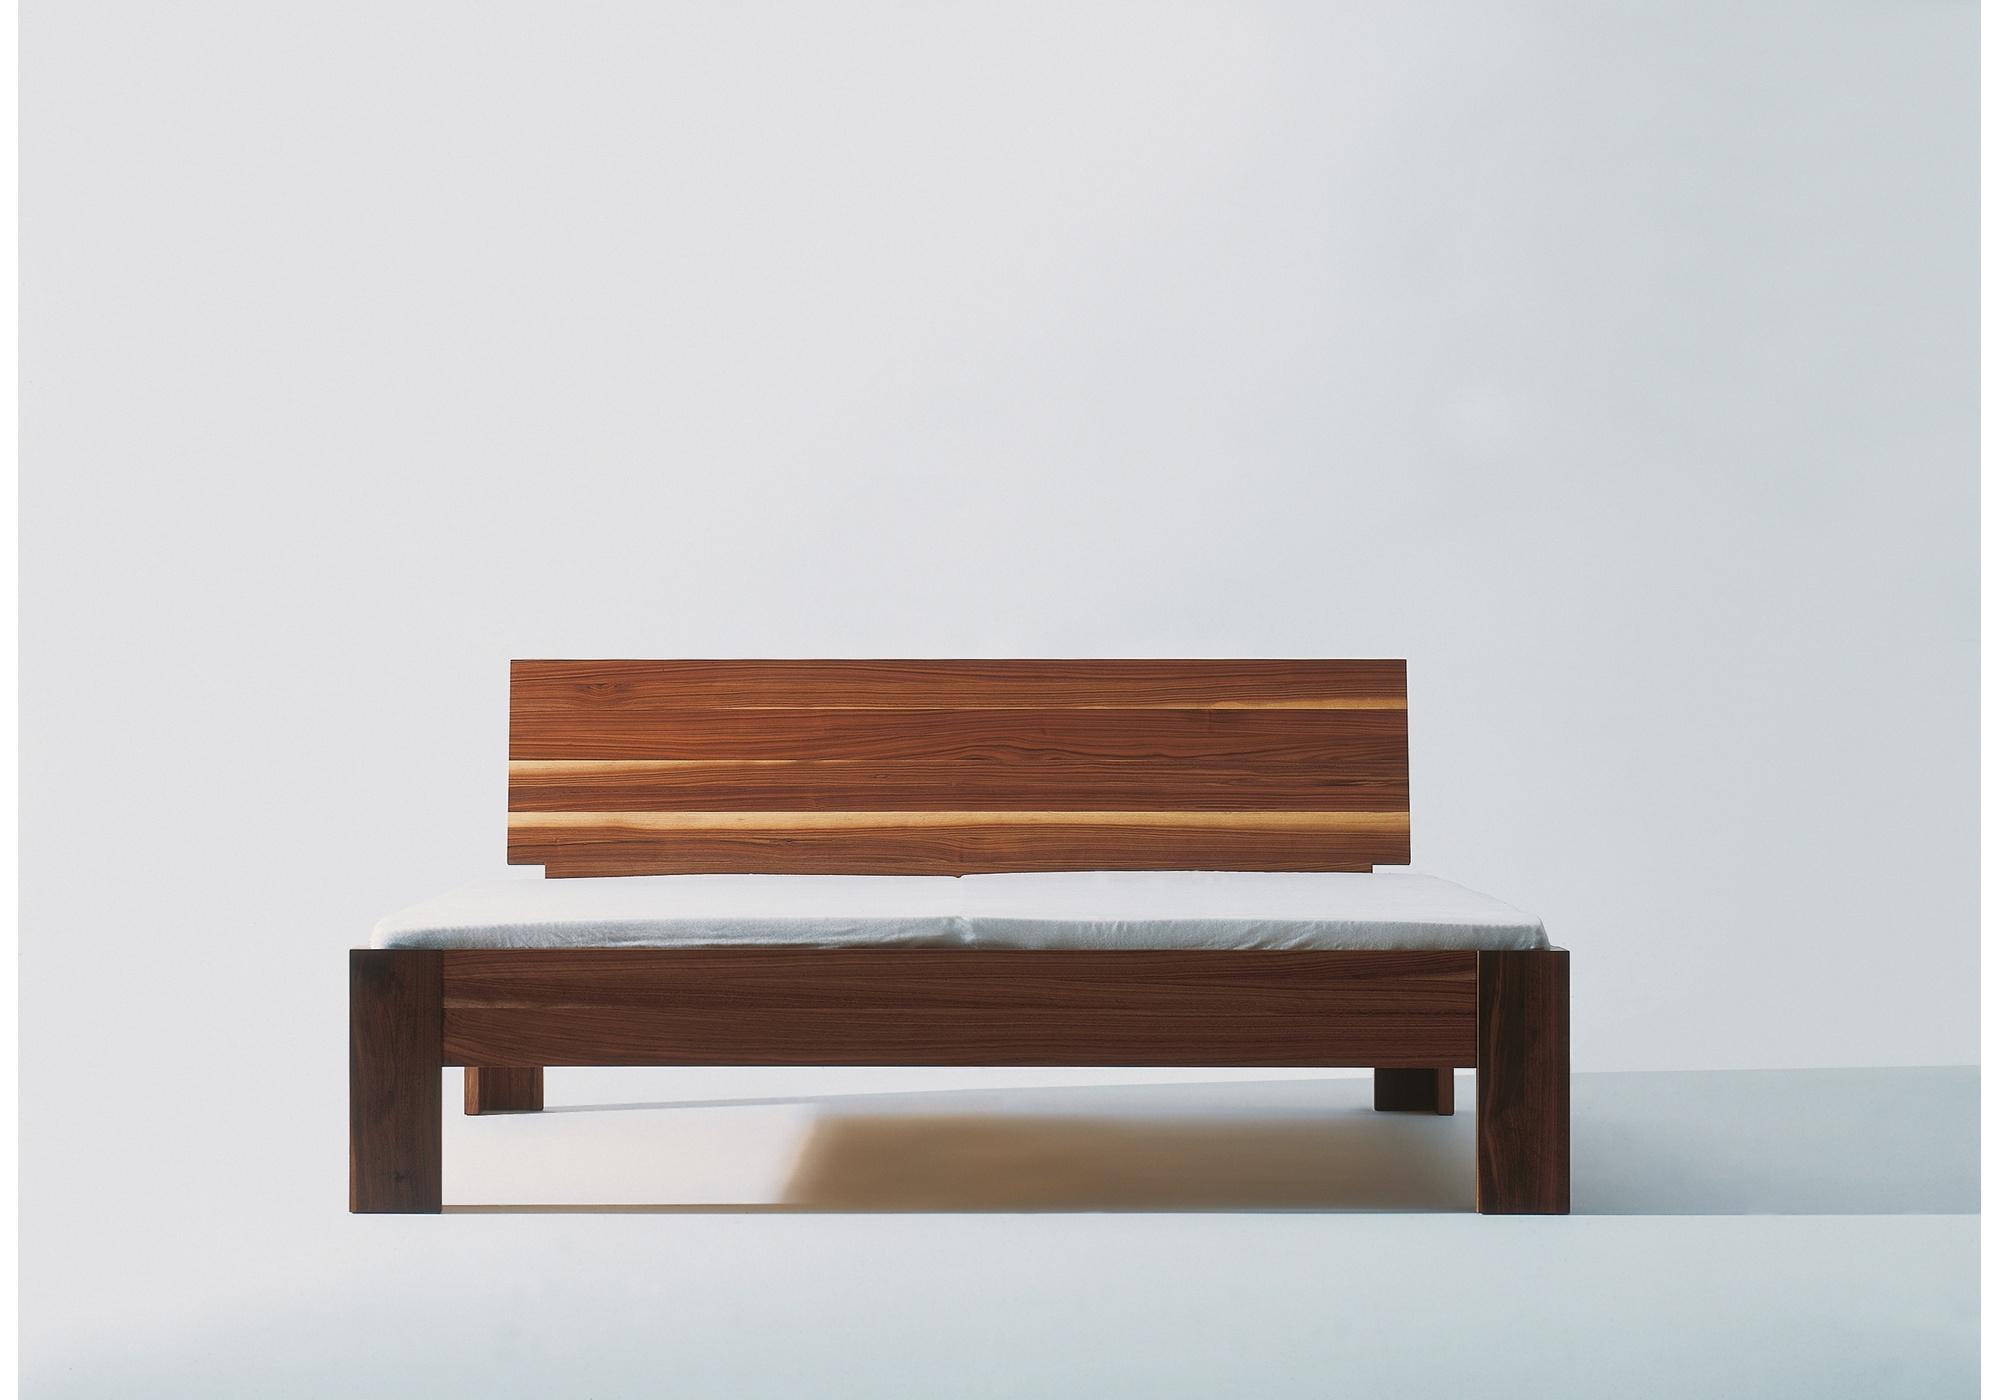 Feldkircher Massivholzbett Antonio - von vorne